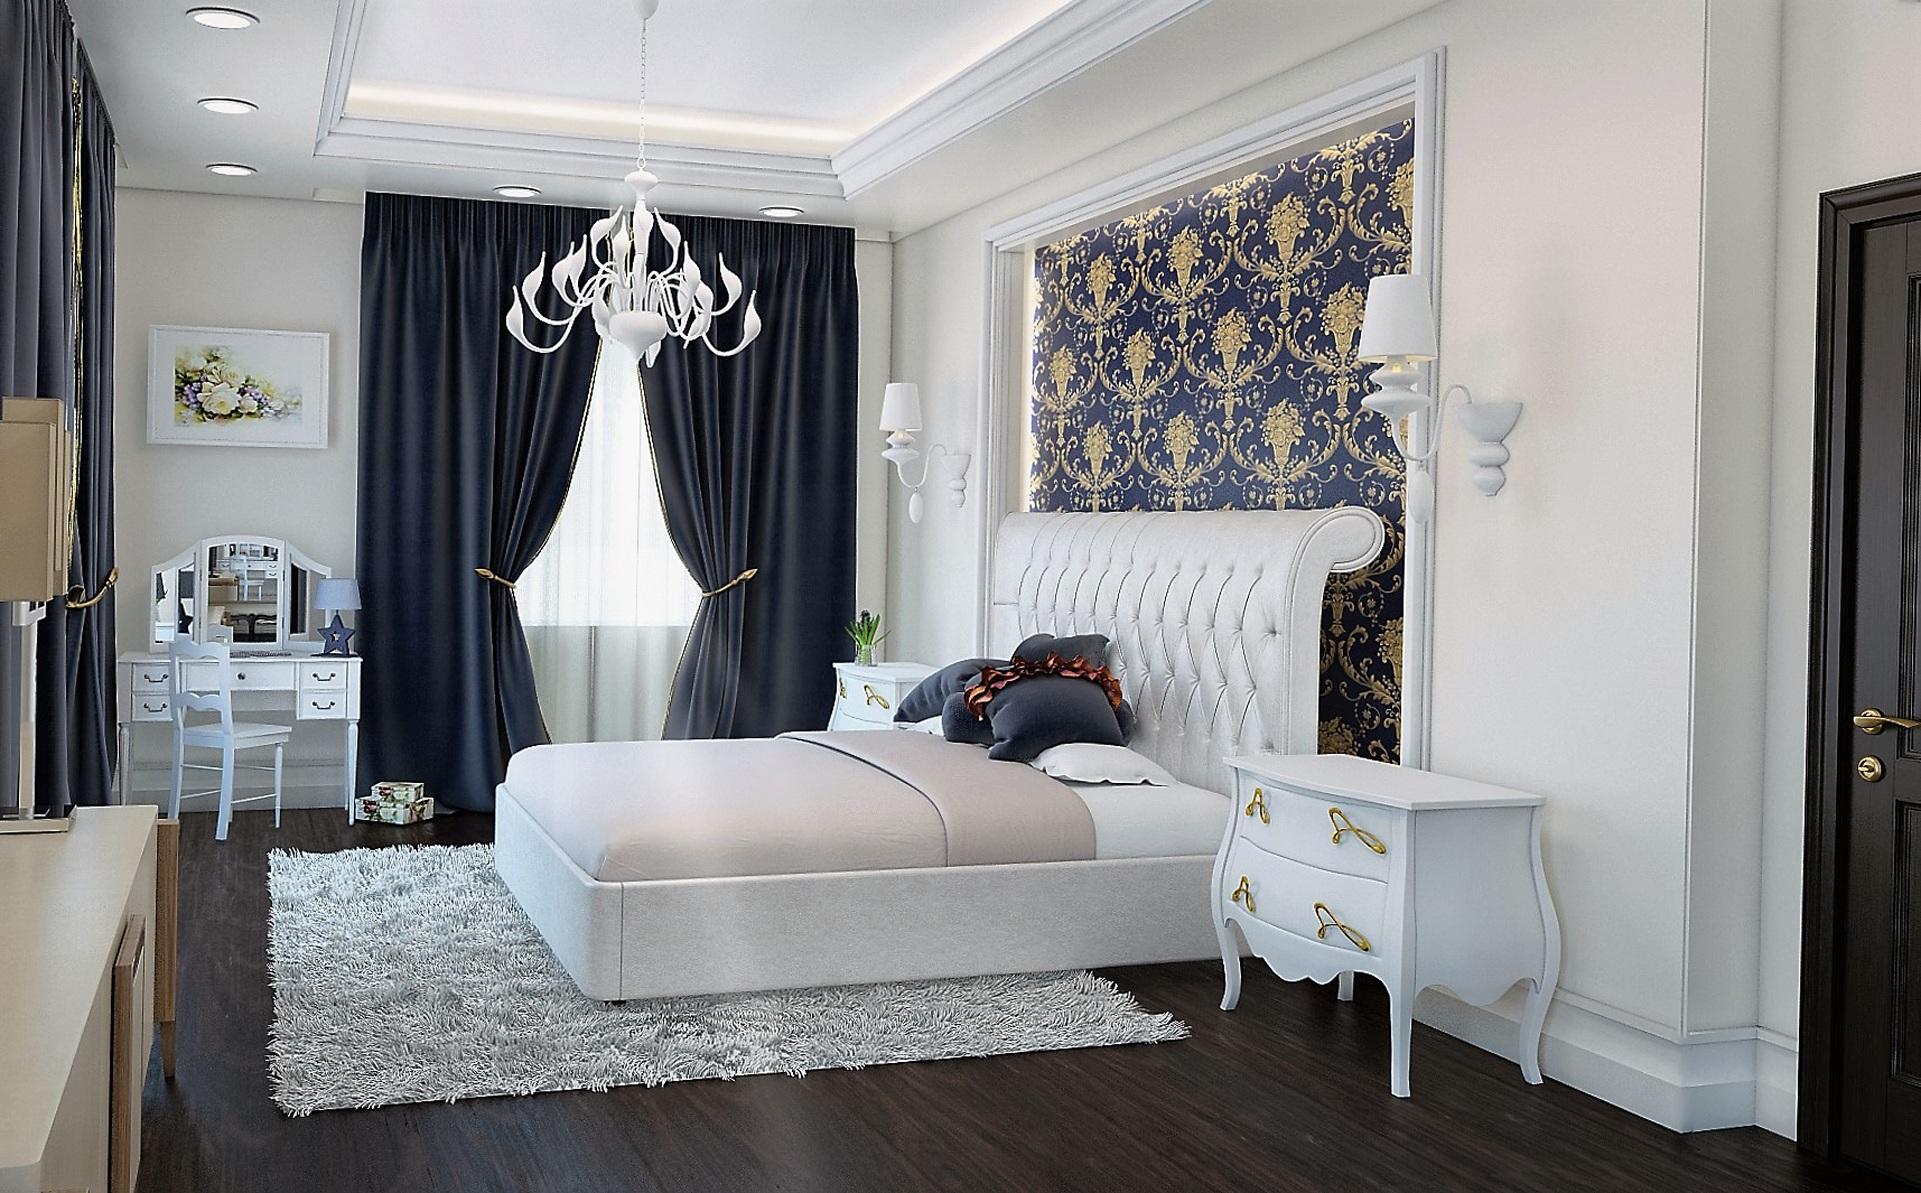 Luxe beat magazine where quality meets luxury - Dormitorios vintage modernos ...